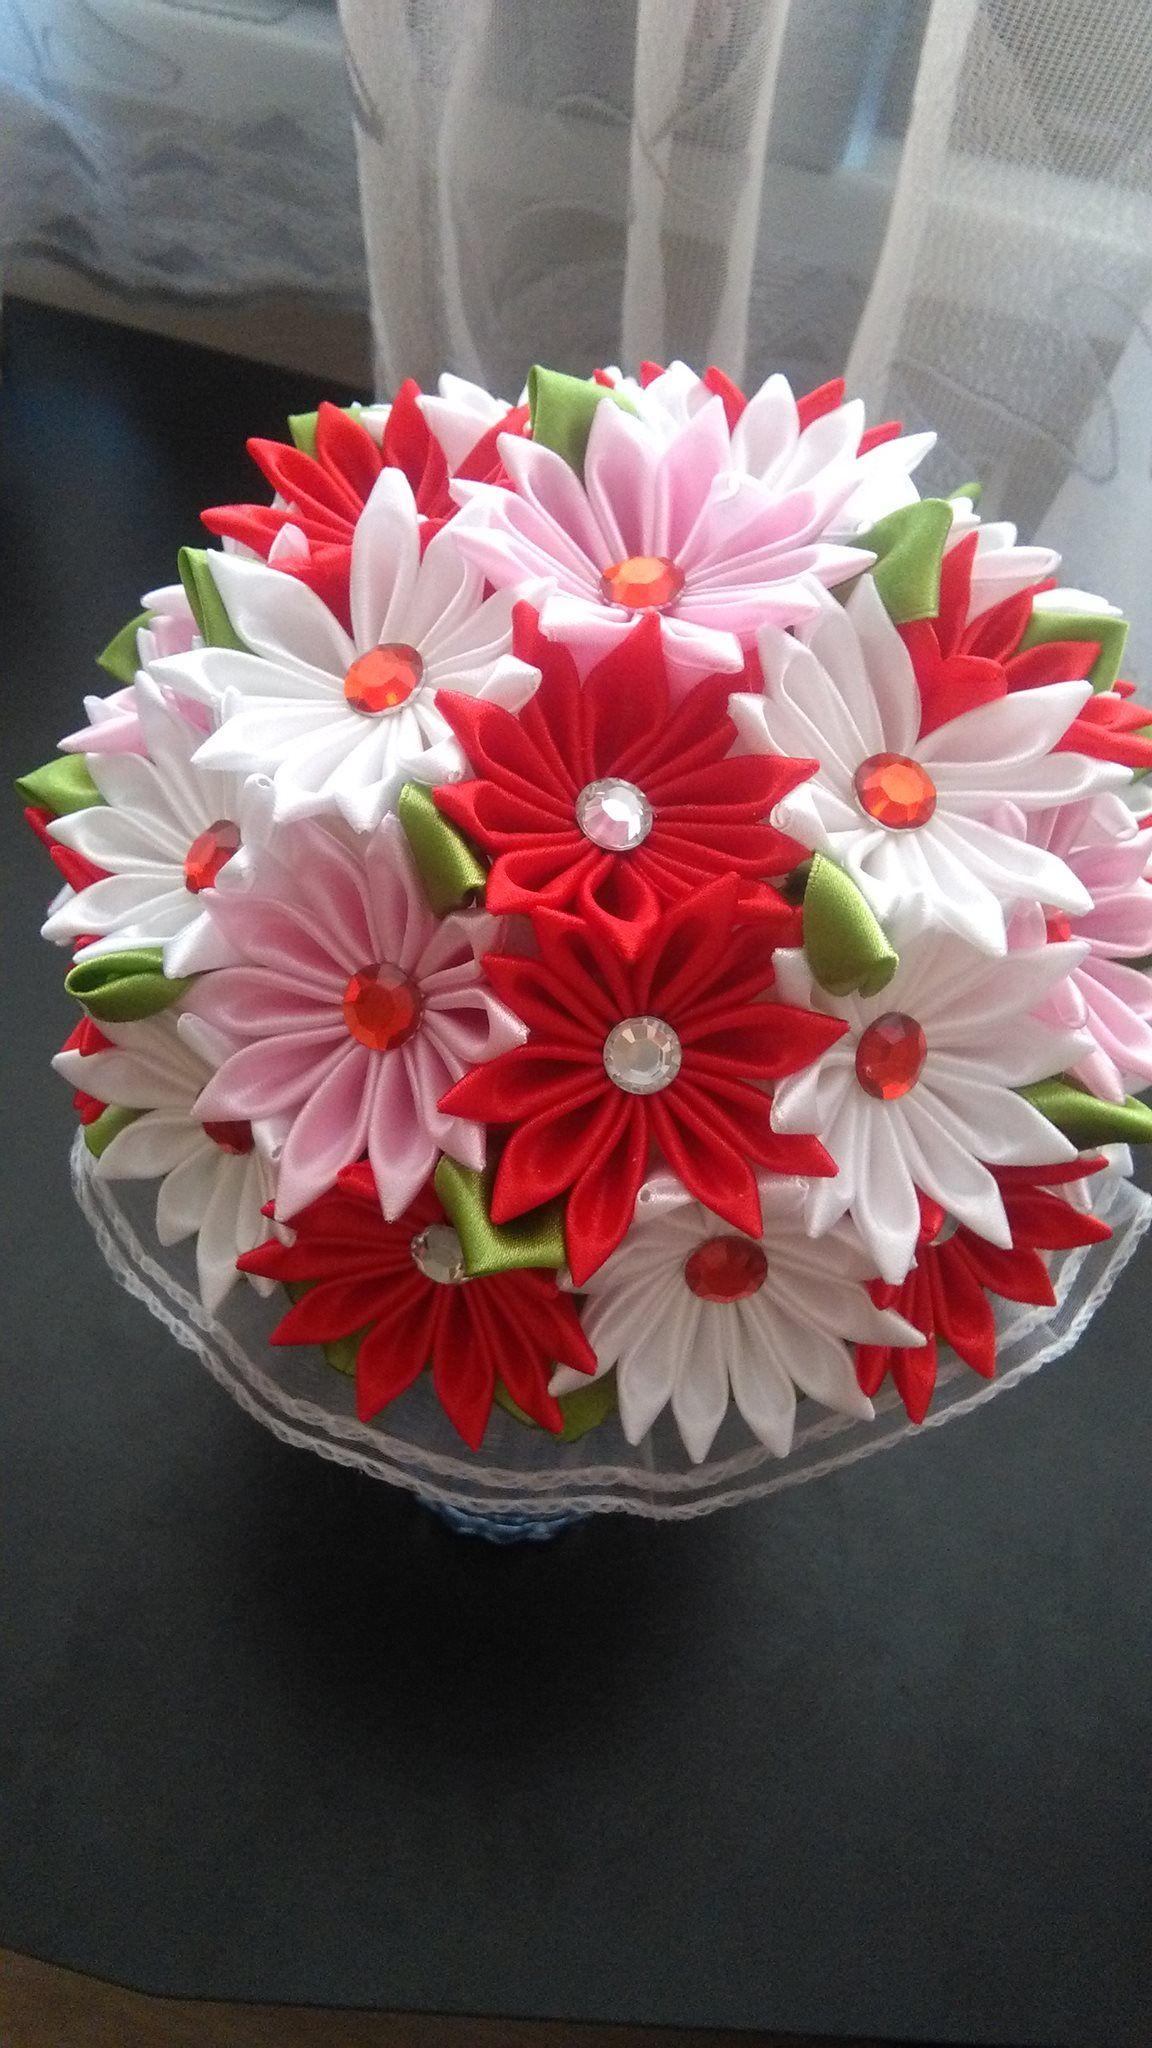 Pin By Ala Klusek On Flower Bouquet Trees Handmade Wedding Bouquet Kanzashi Flowers Flower Crafts